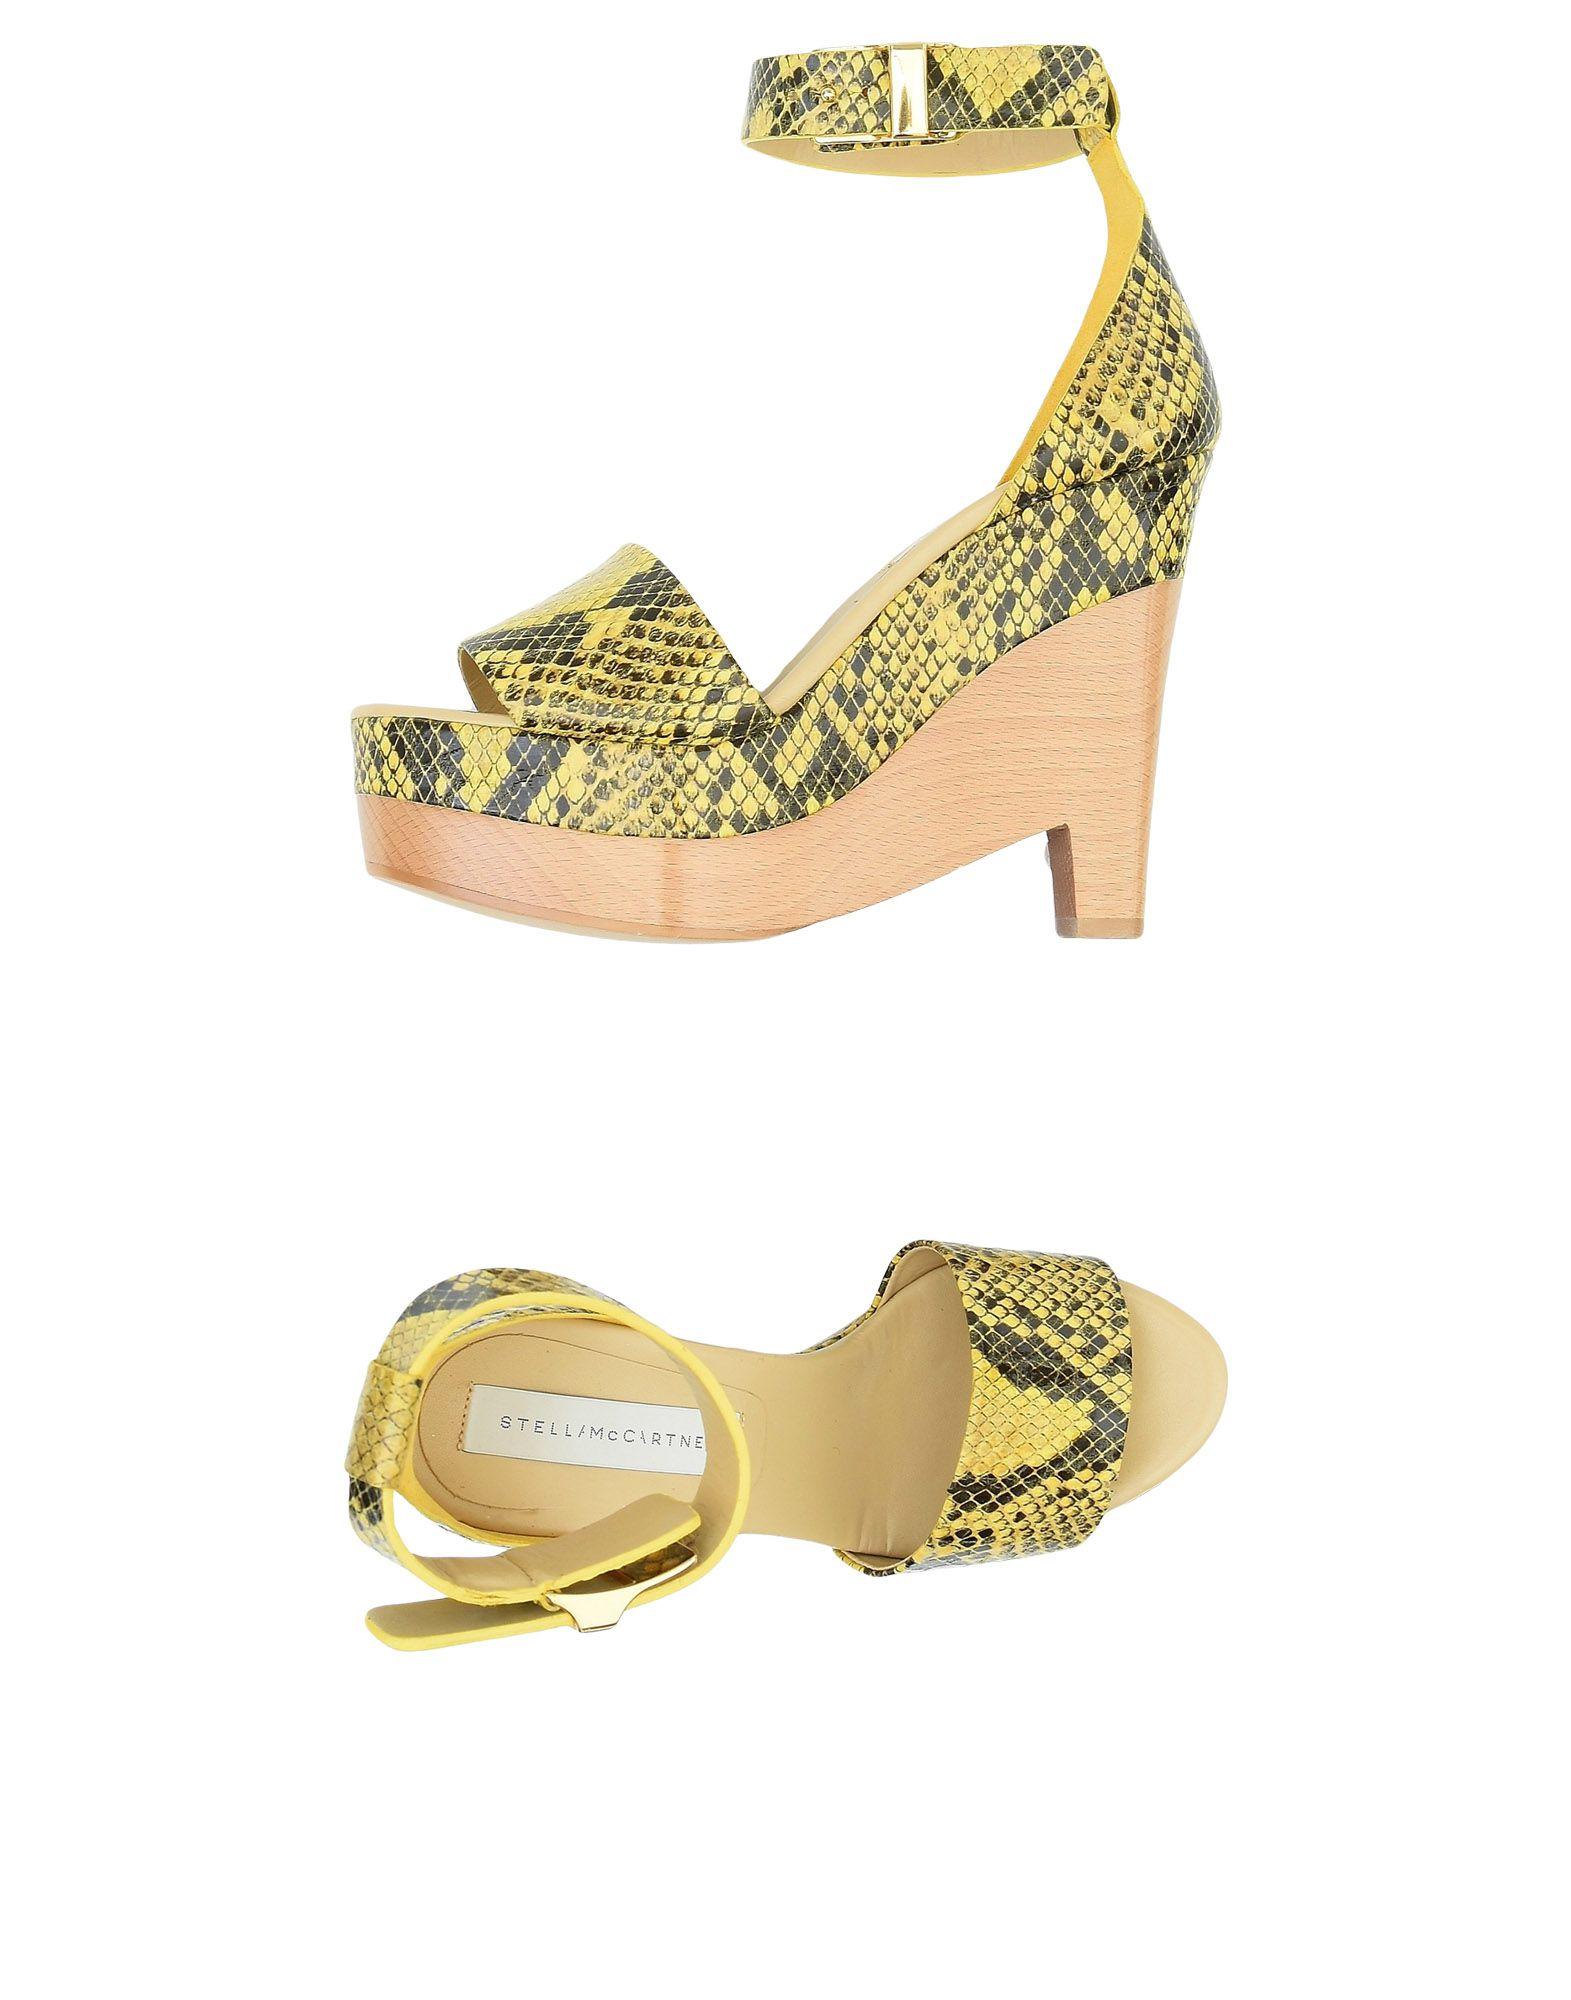 Stilvolle billige Schuhe Stella Mccartney Sandalen Damen  11484608DW